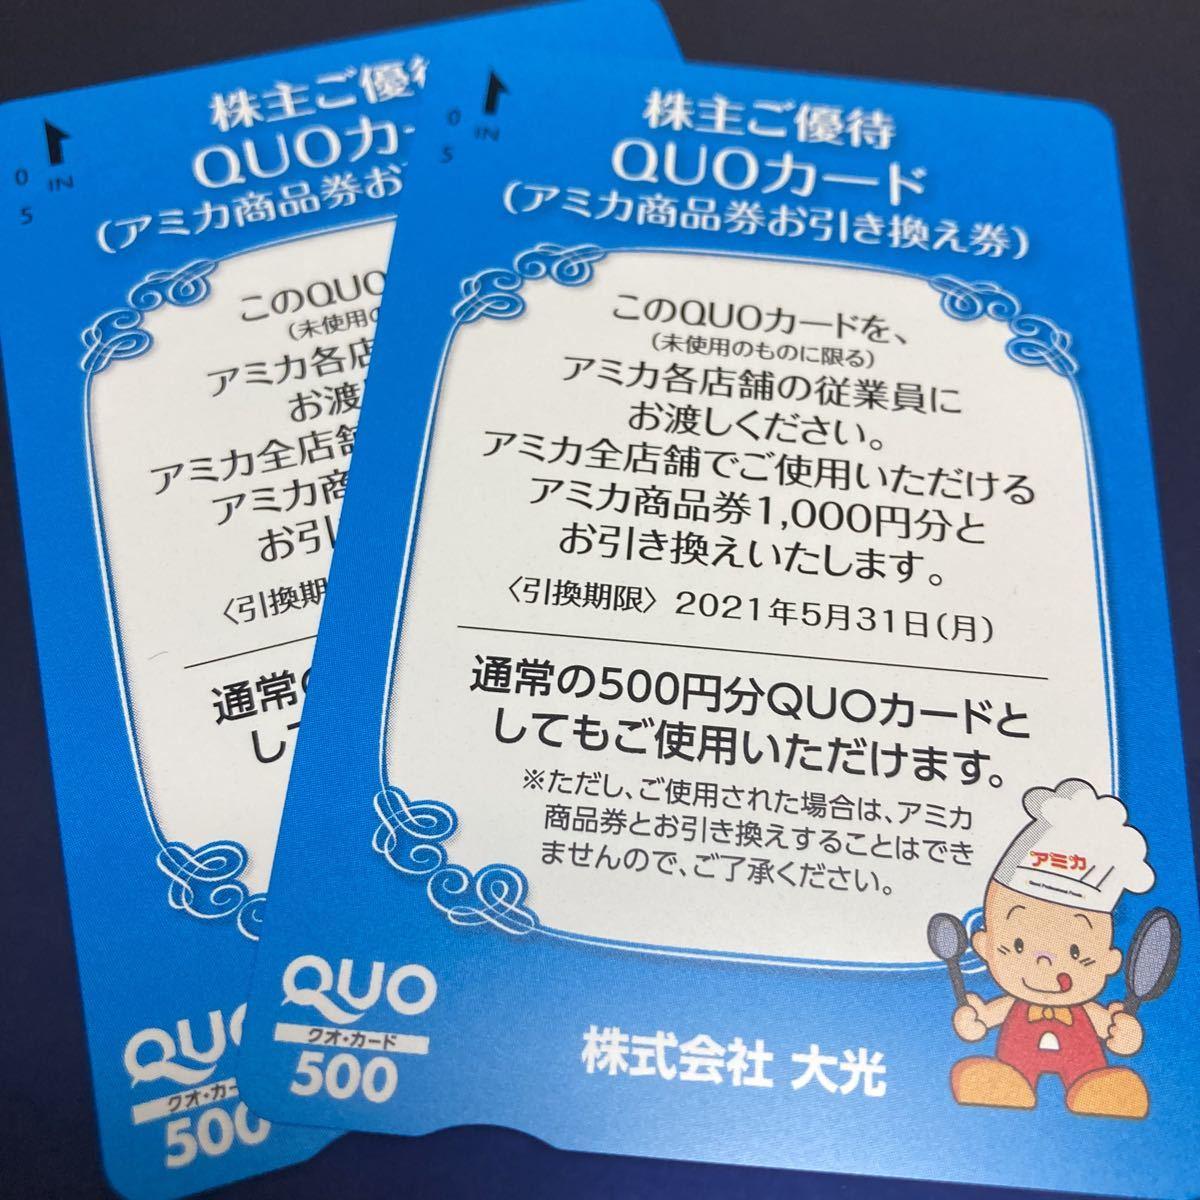 Amiki gift certificate 2000 yen (quo card 1000 yen)